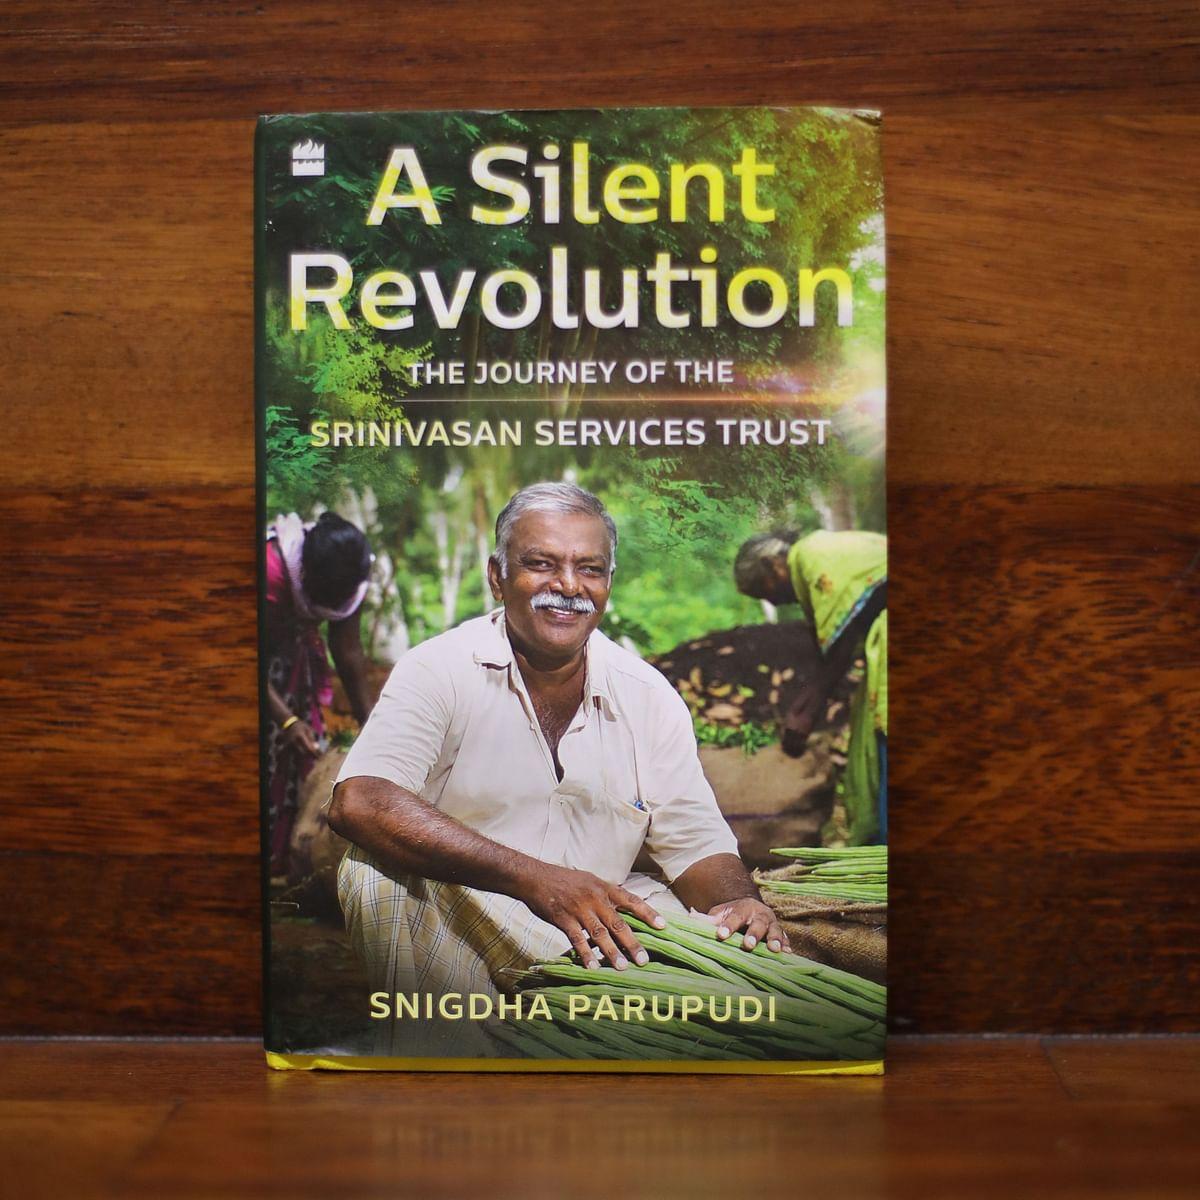 A Silent Revolution